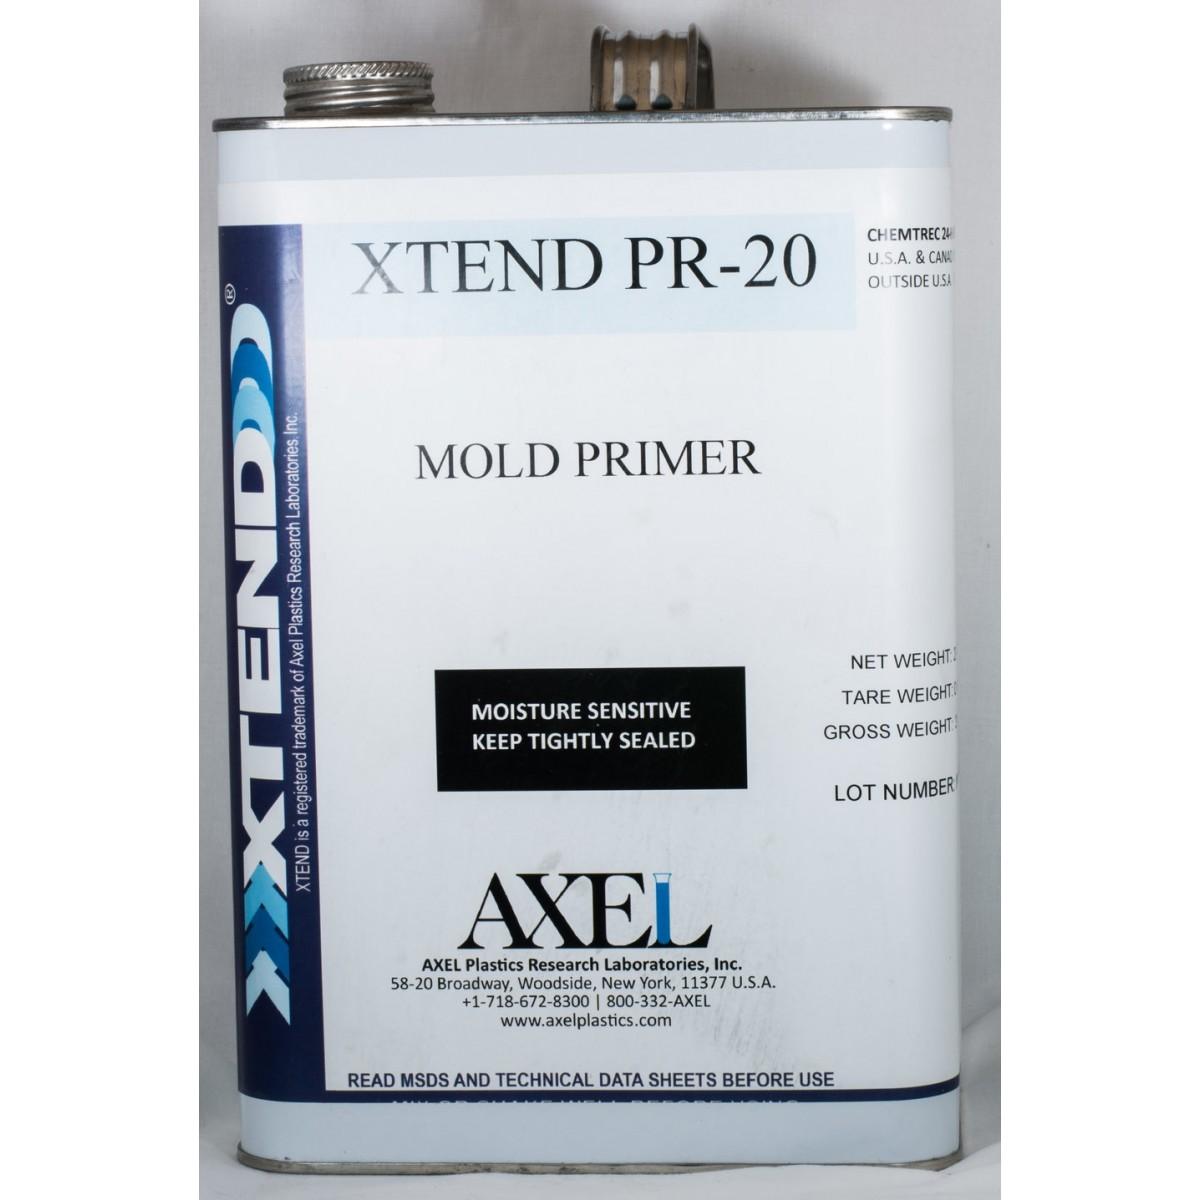 Axel XTEND PR-20-31